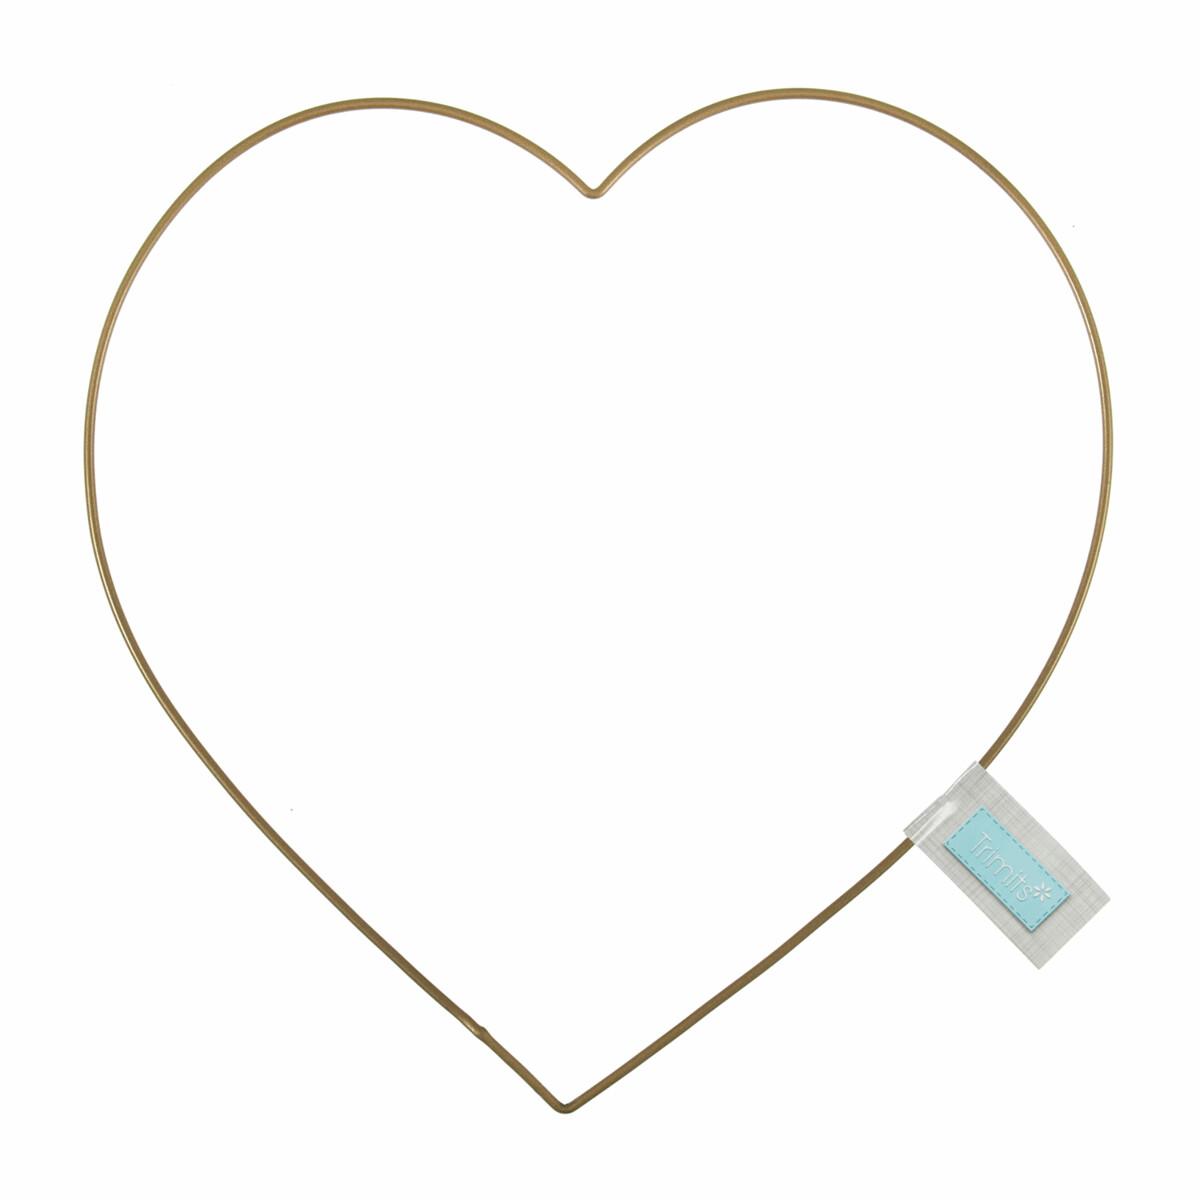 Craft Hoop Metal Heart Wire Frame 20cm Gold